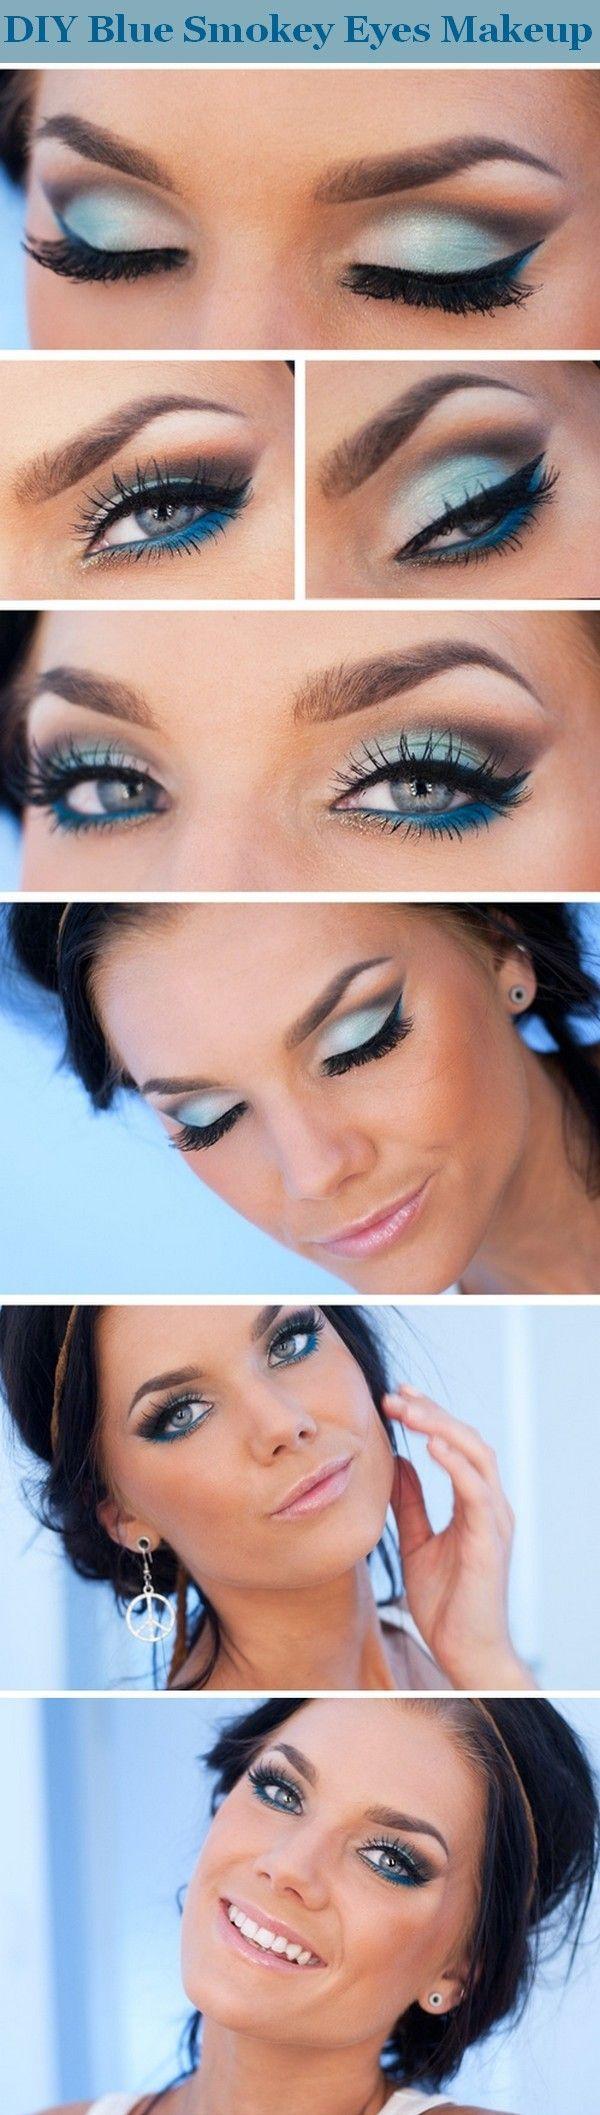 25+ best ideas about Blue eye shadow on Pinterest | Navy makeup ...